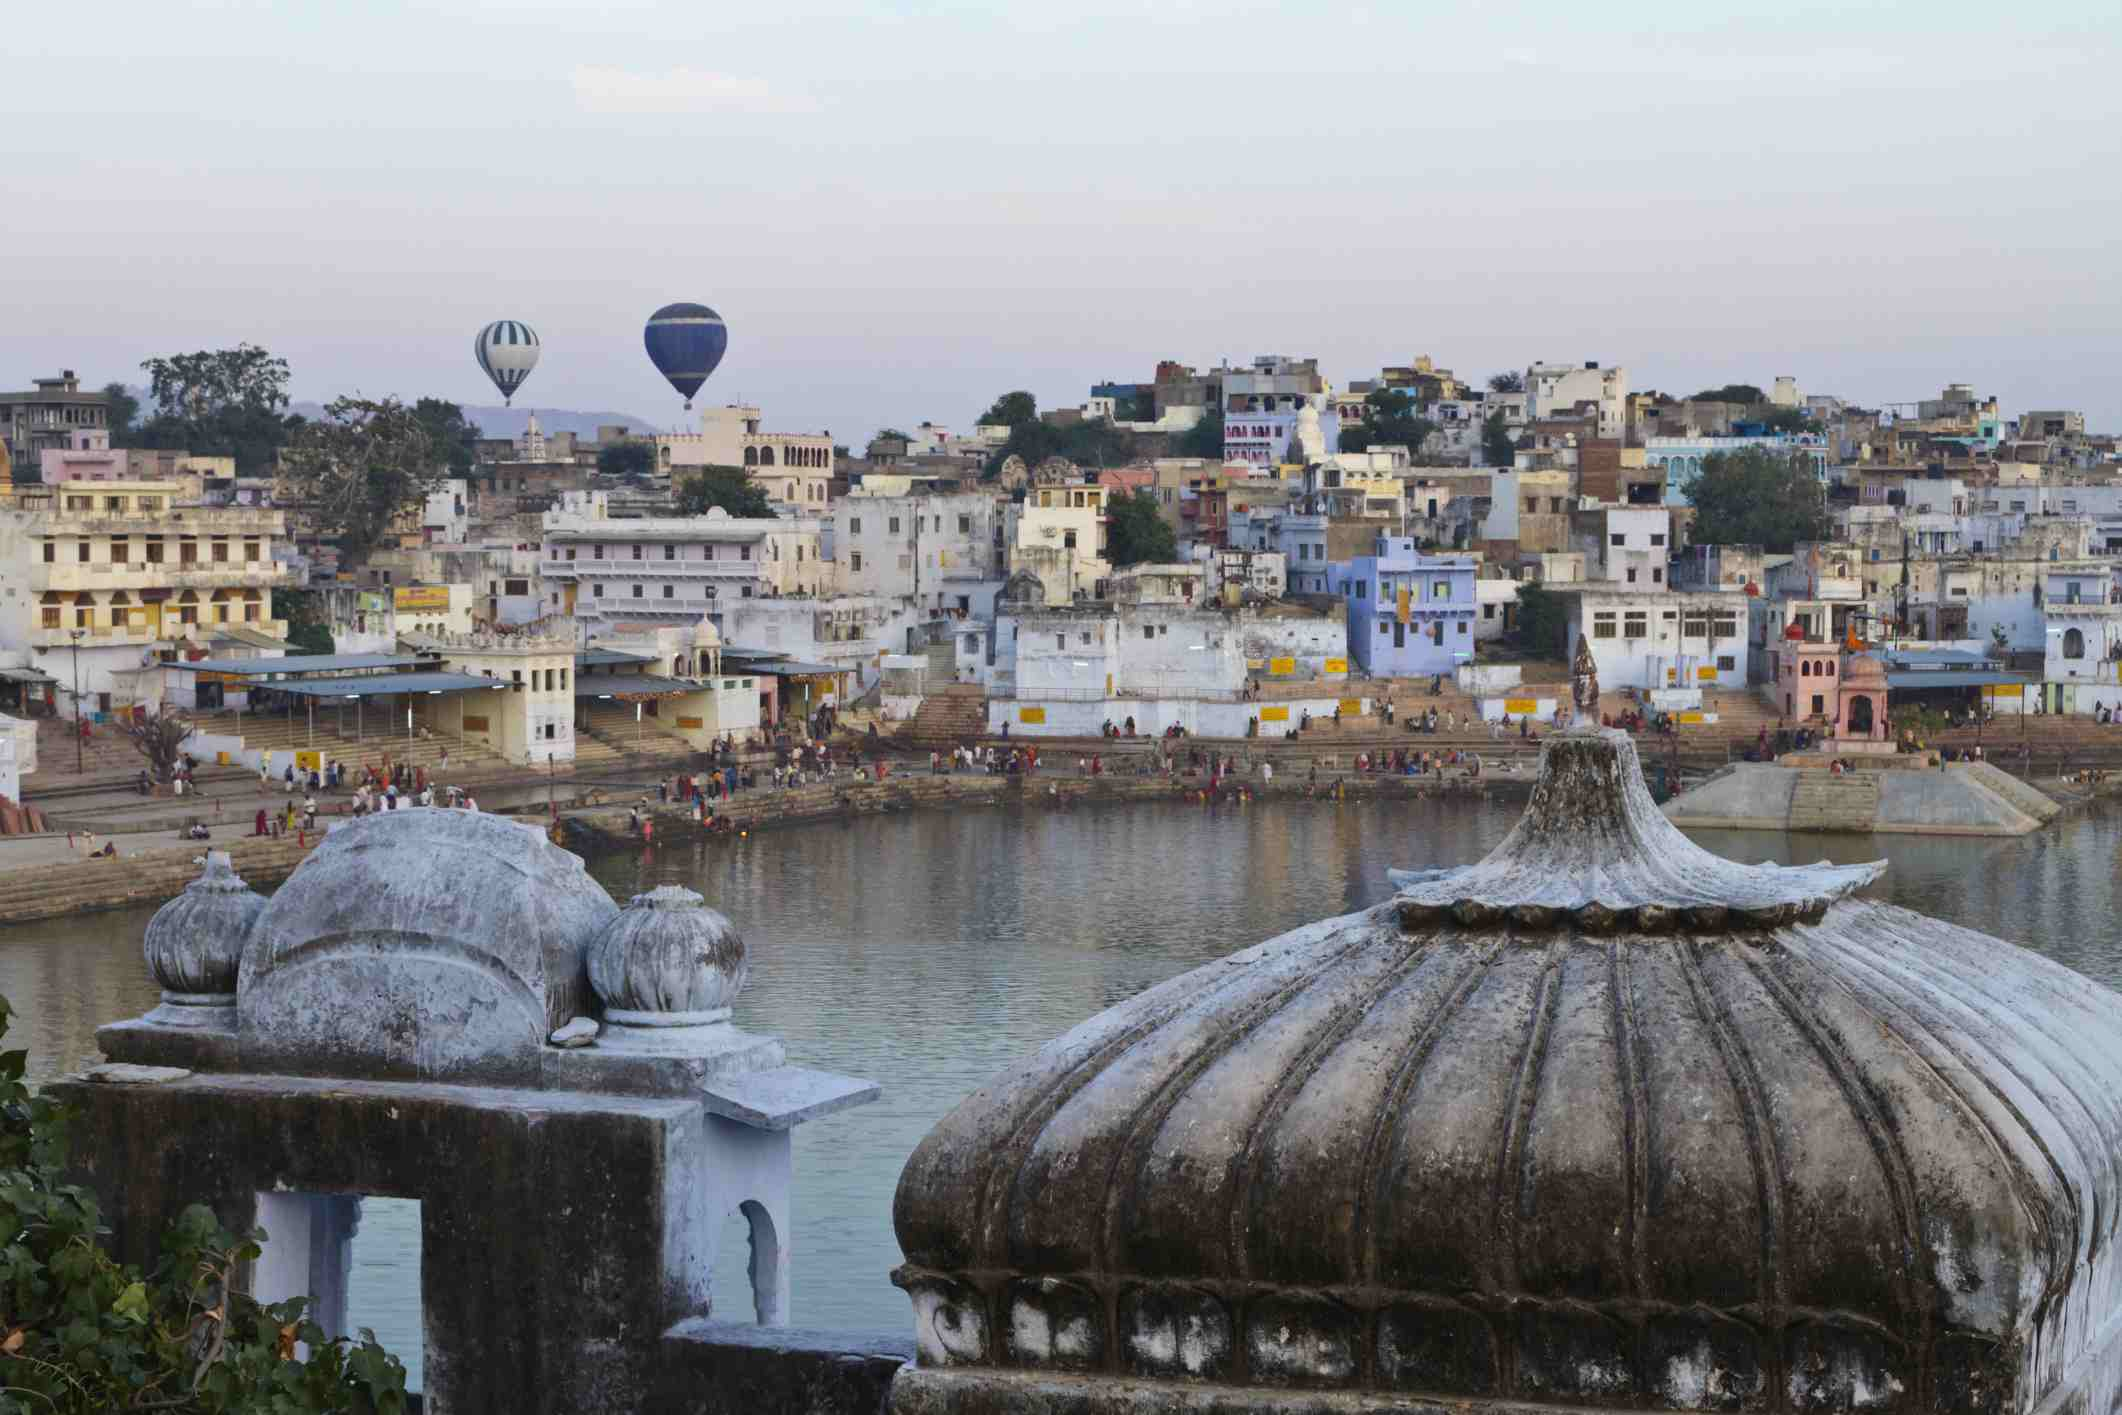 Hot air balloons in Pushkar, India.